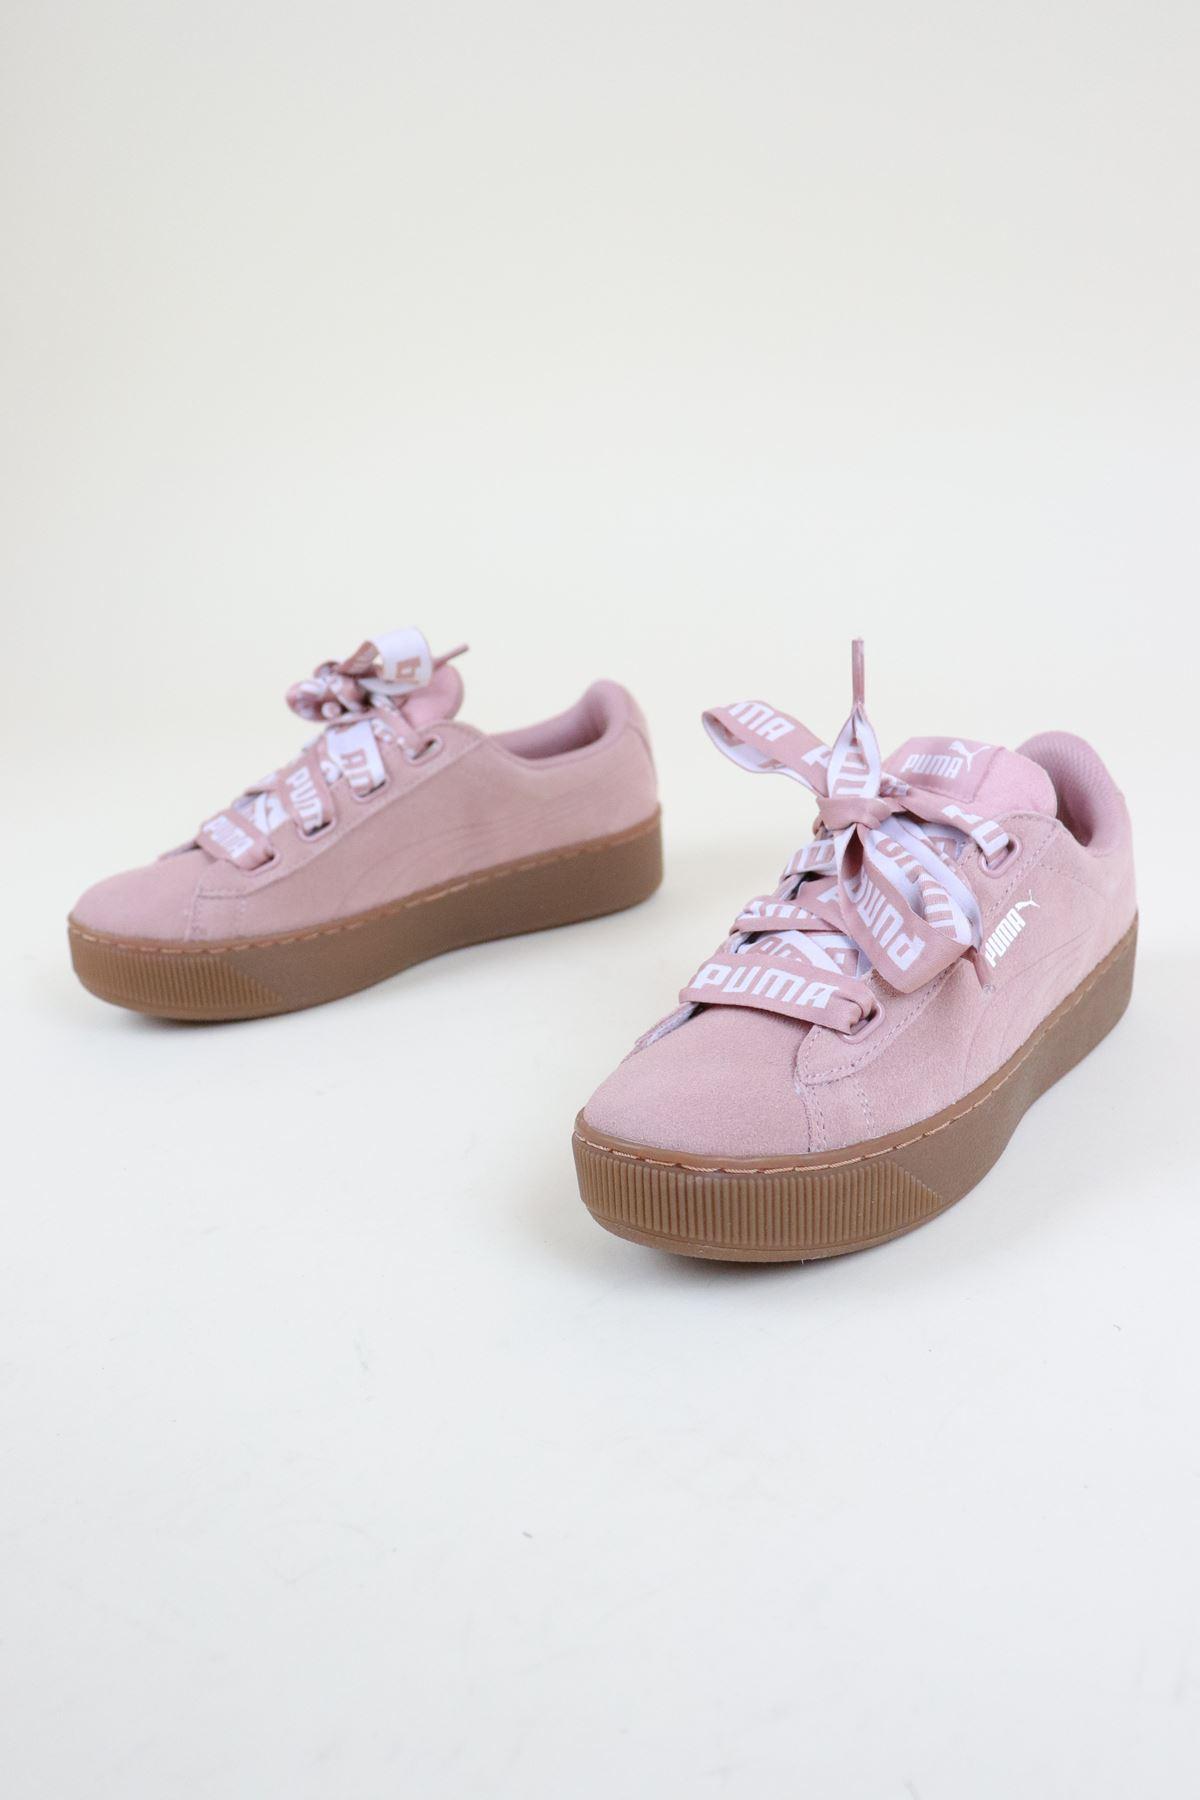 Puma 6531403 Pudra Kadın Spor Ayakkabı